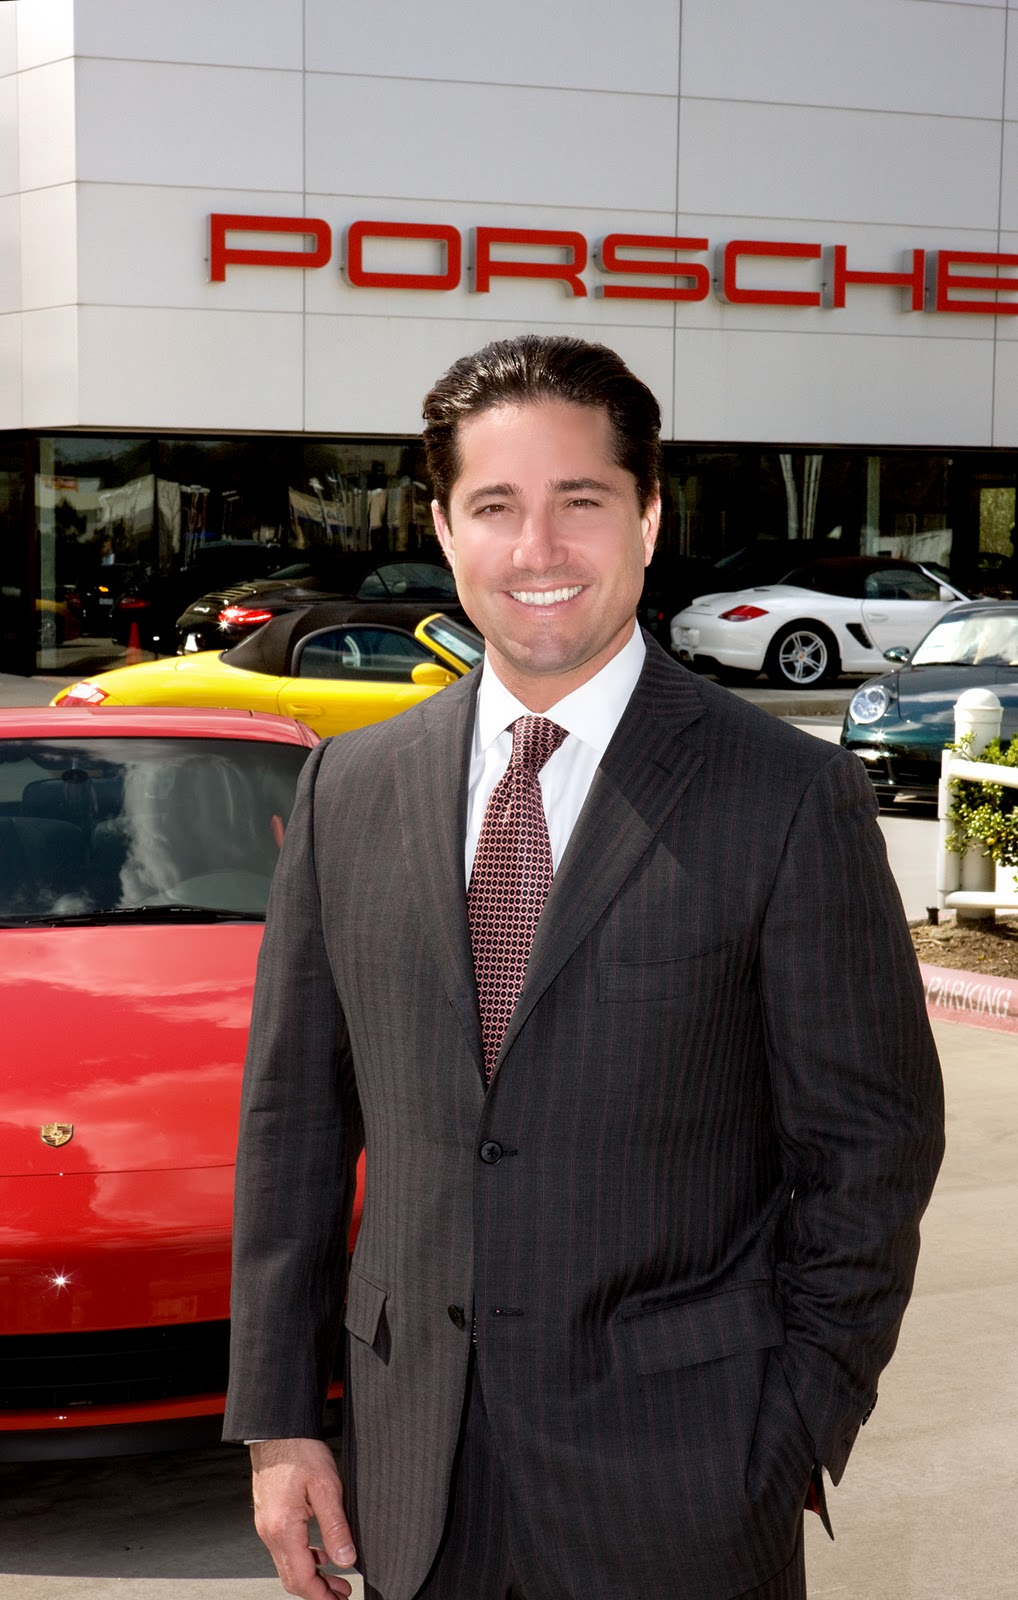 Porsche North Houston >> Porsche of North Houston: Todd Blue to be Featured in Houston Magazine's 2011 Men of Style Issue